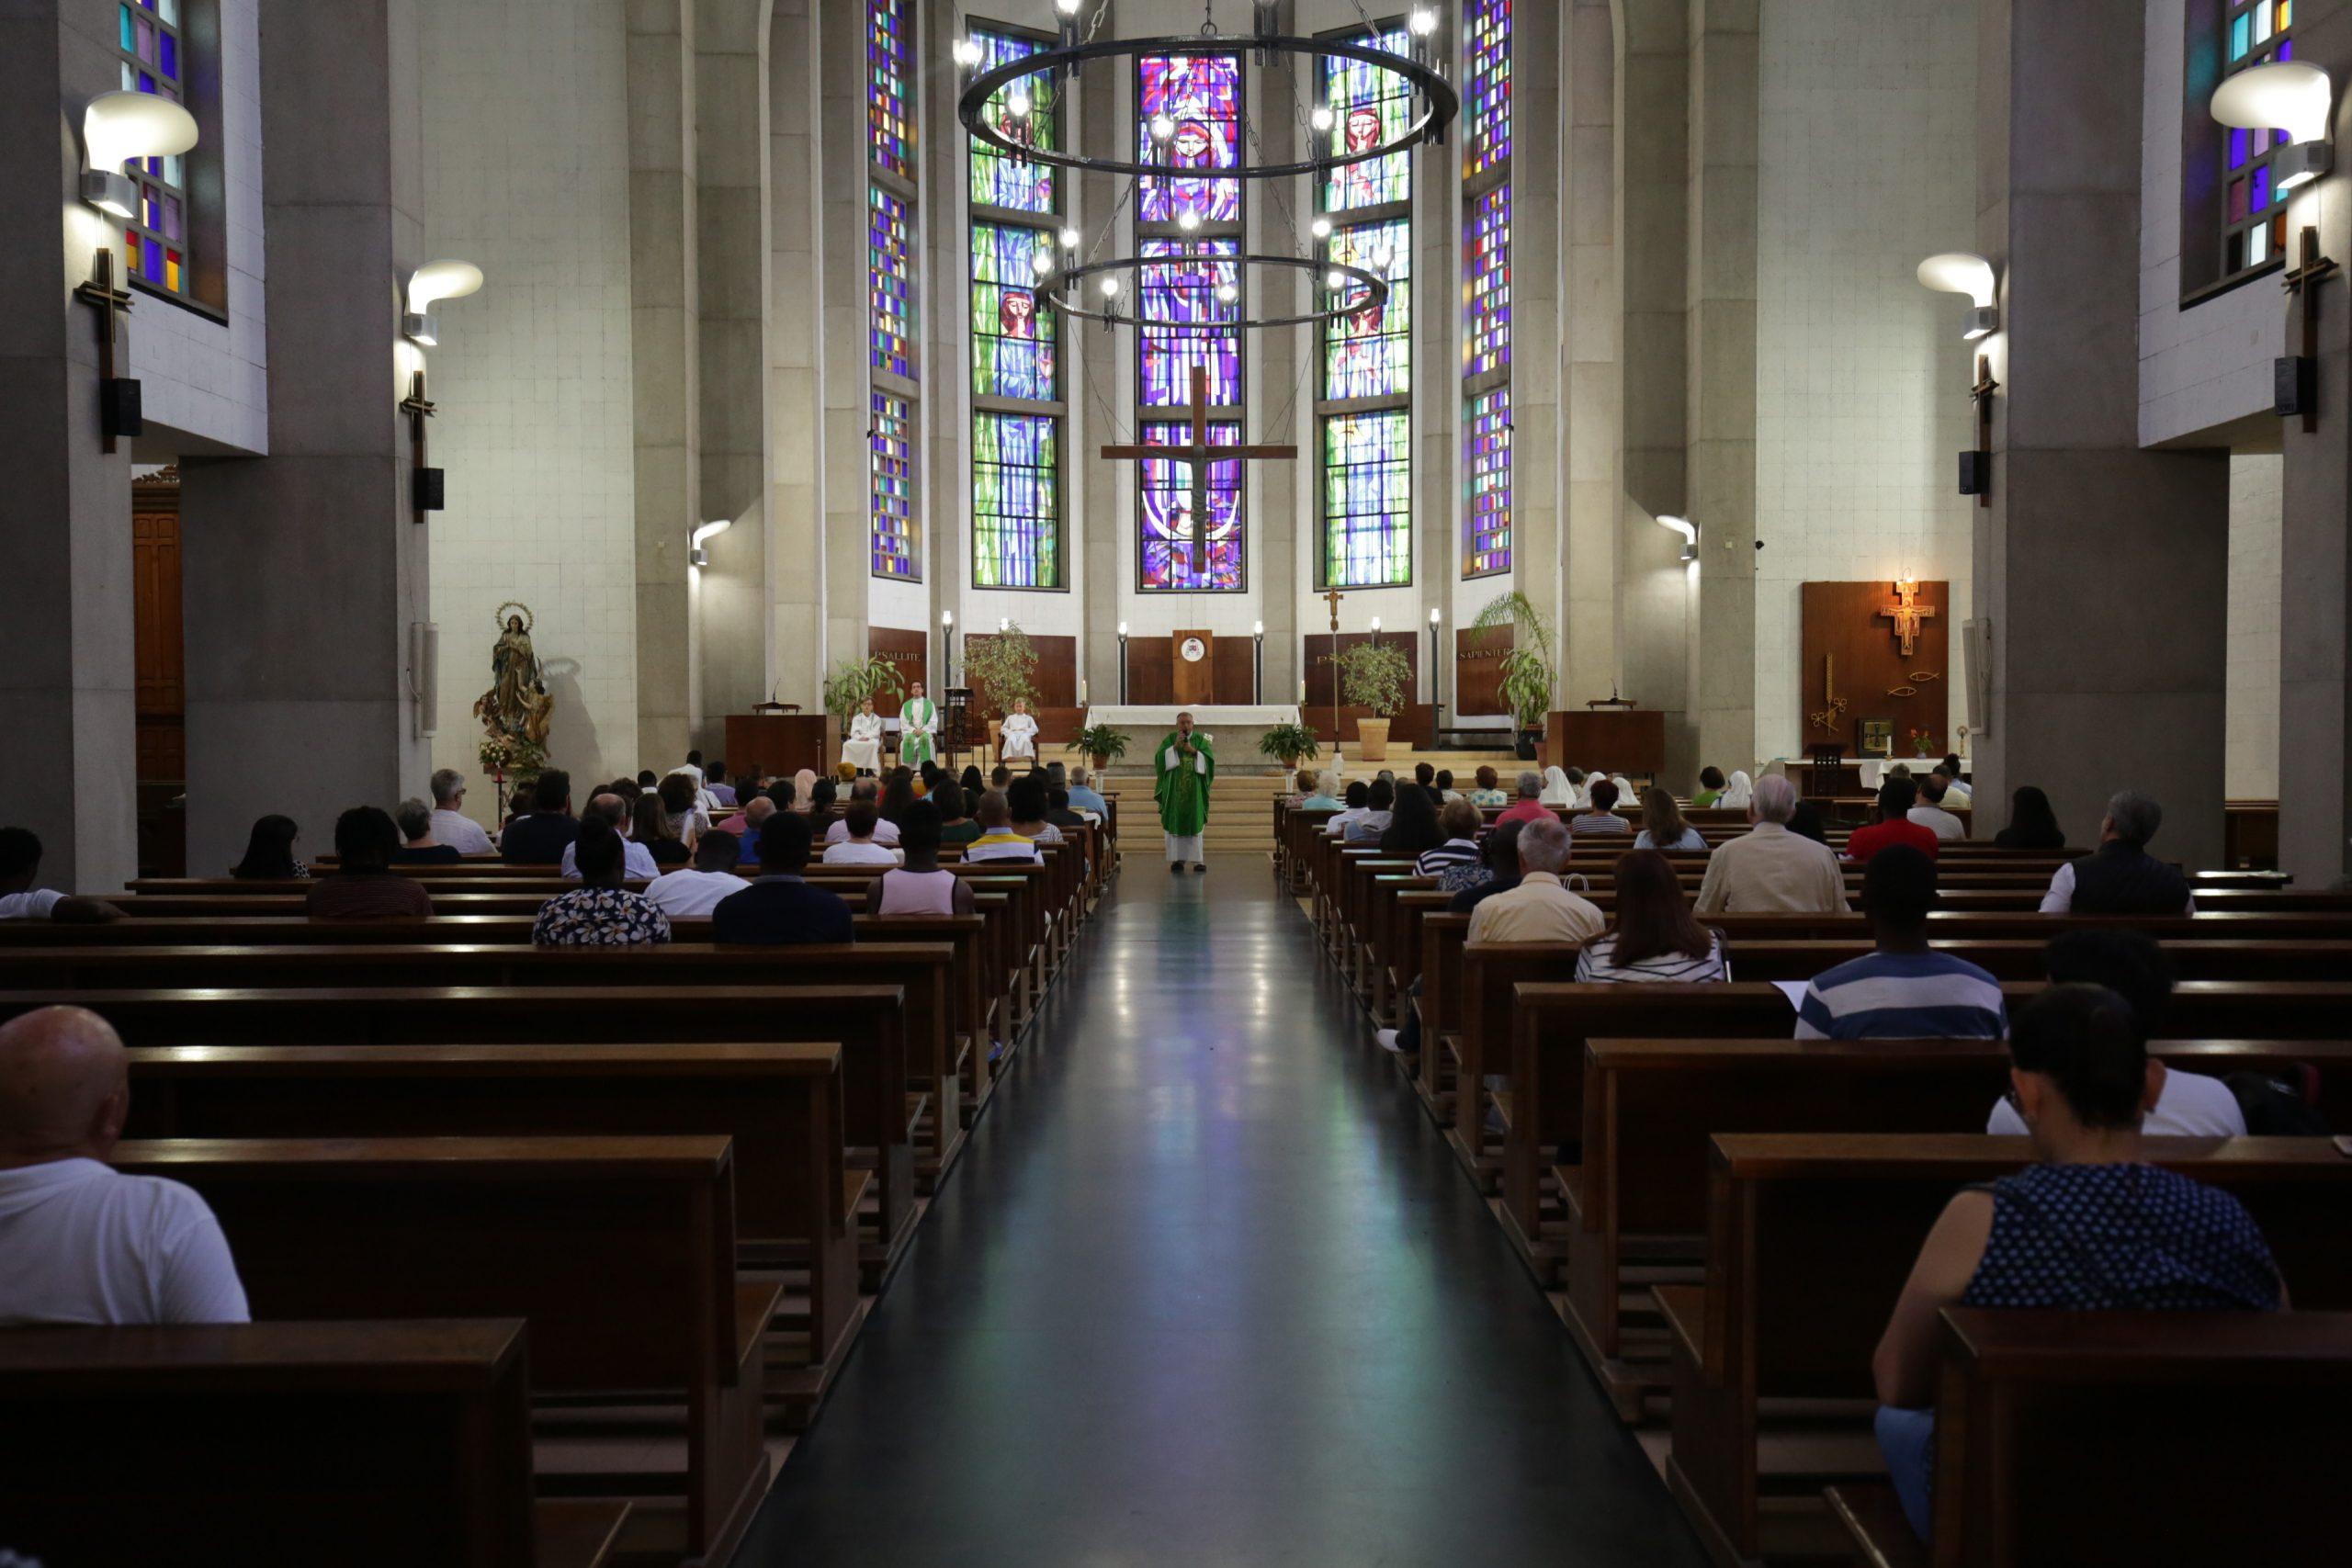 Misa en la Catedral de Tánger - Kiko Fernández